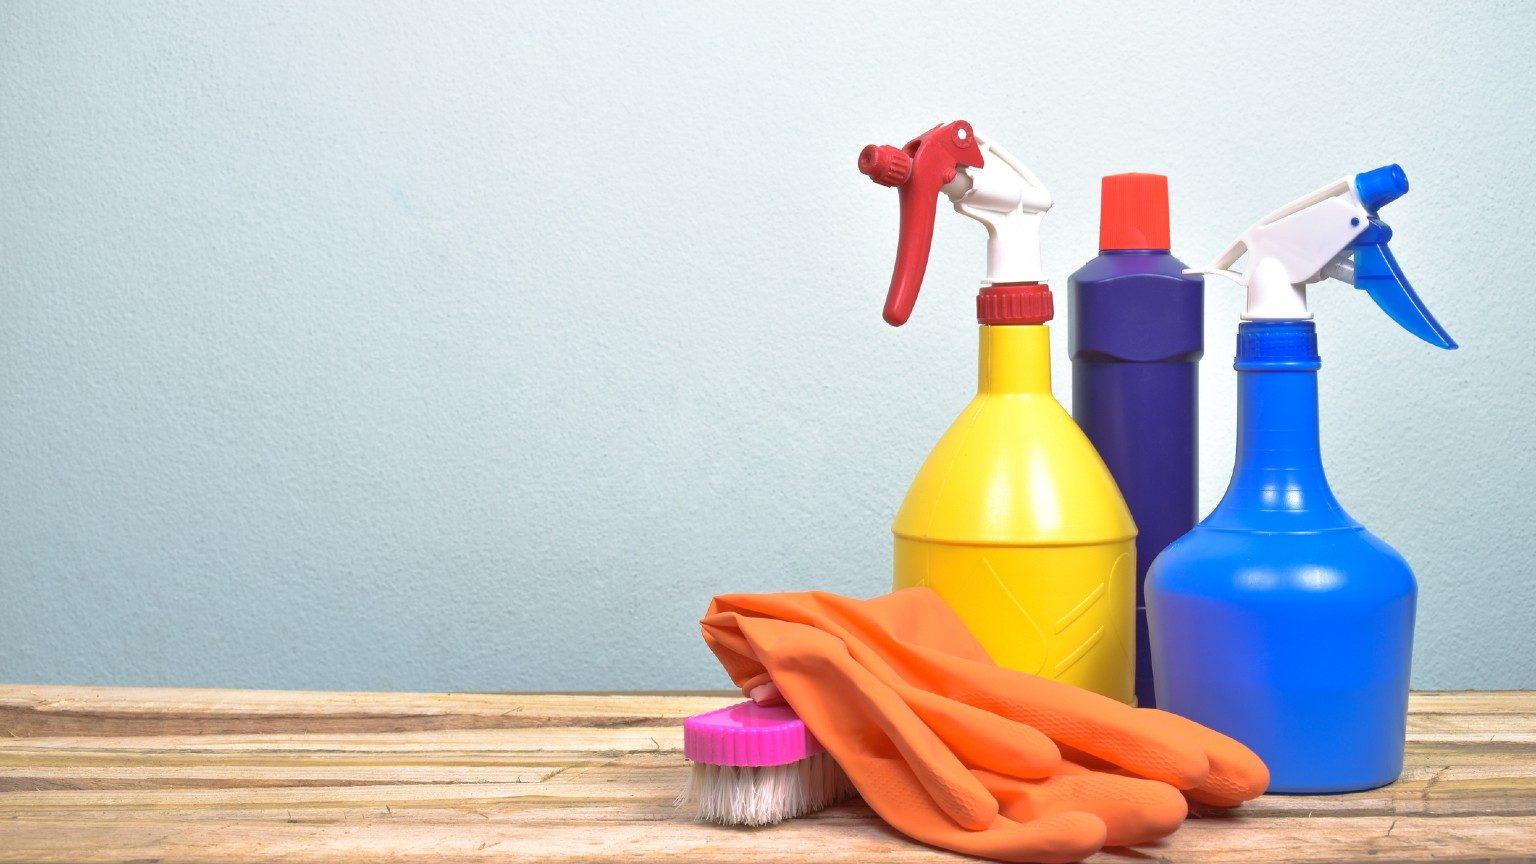 Household Bleach & Disinfectant